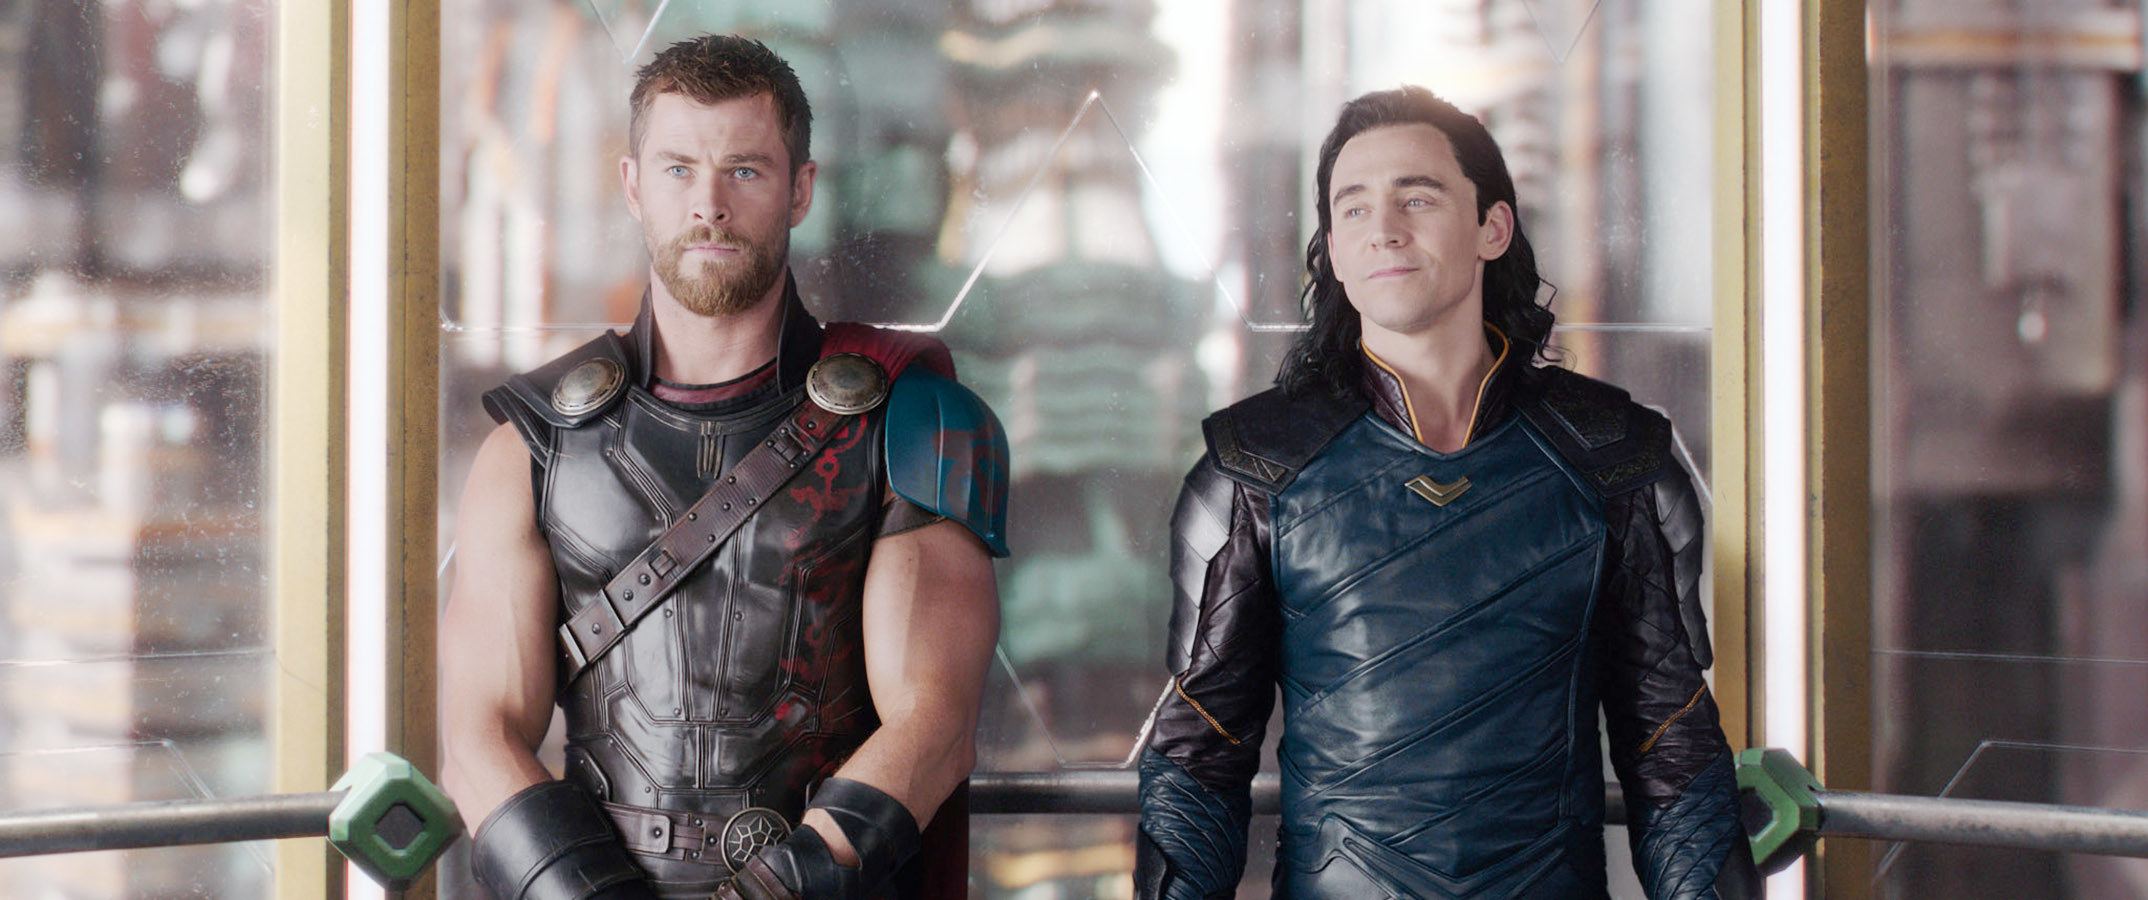 Thor and Loki in Thor: Ragnarok